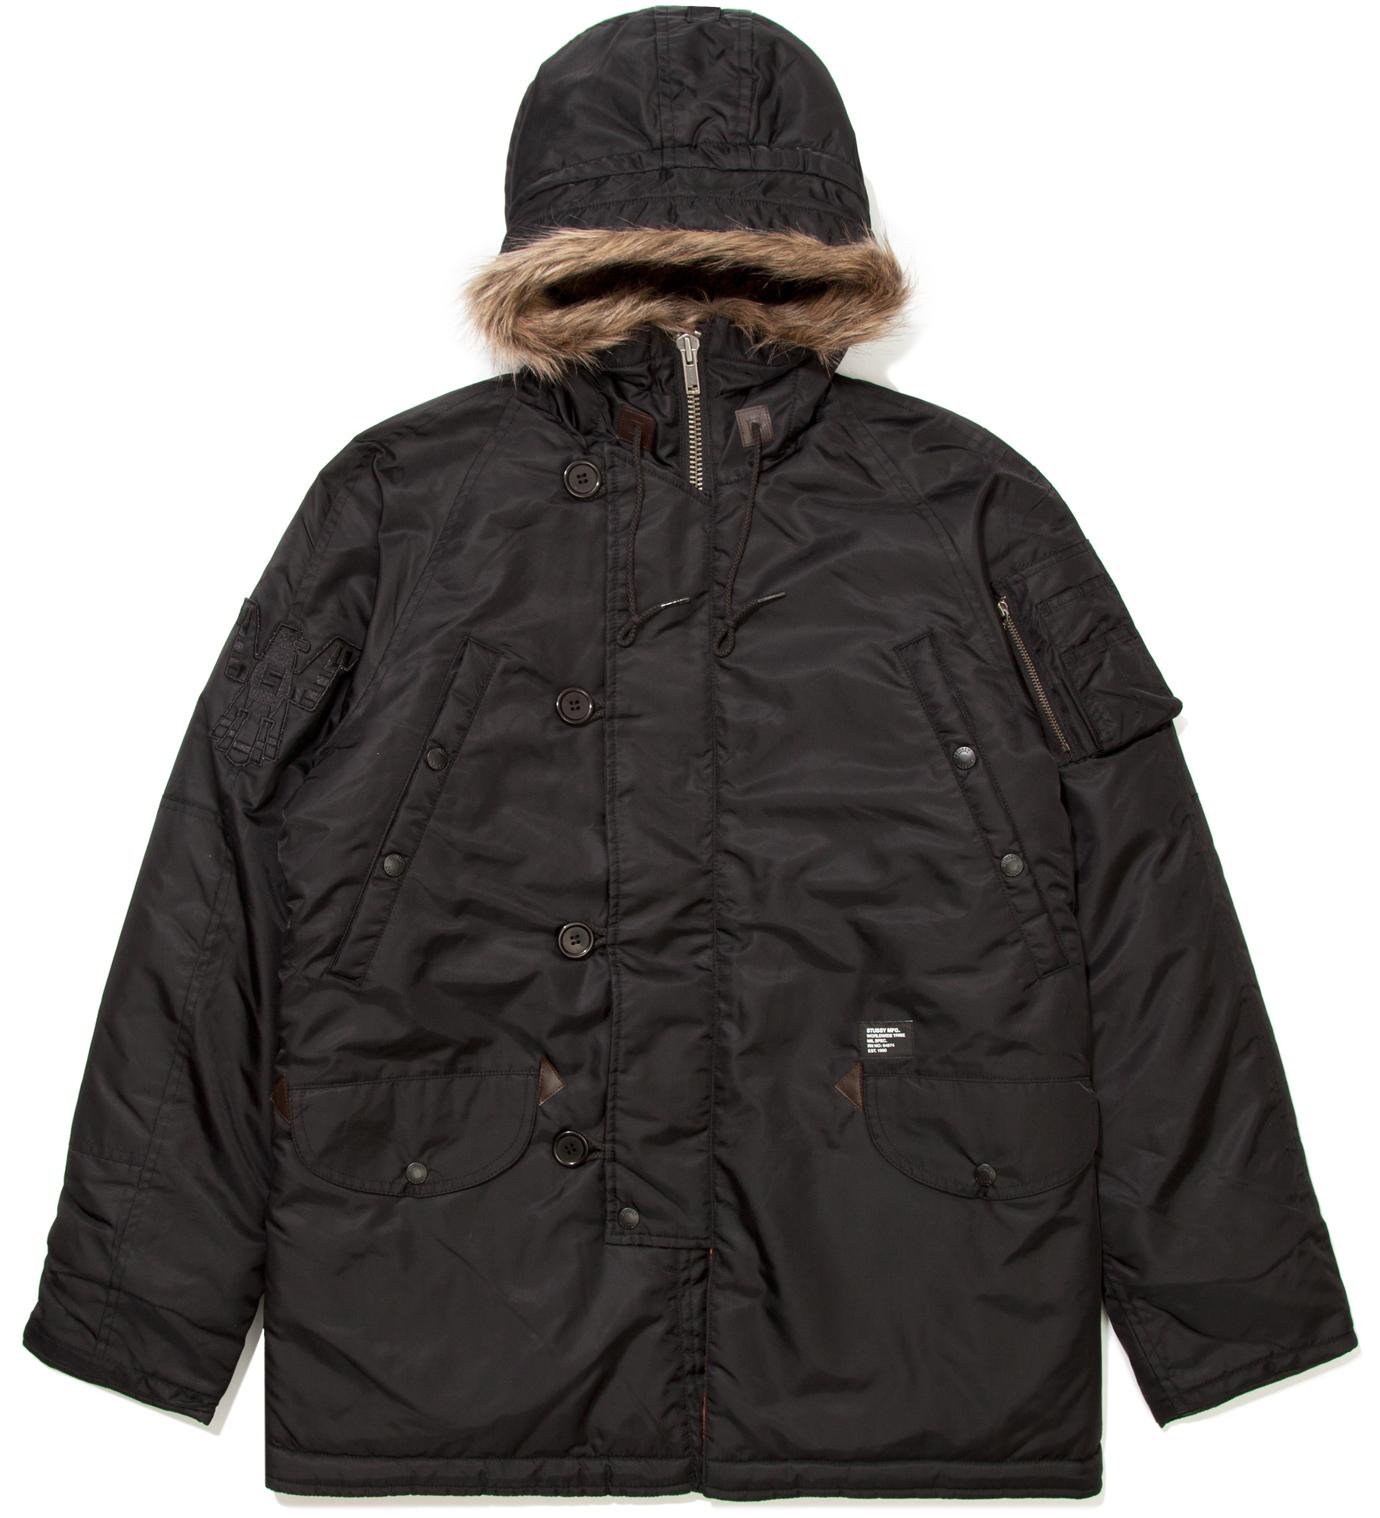 Stussy Black Snorkel Jacket